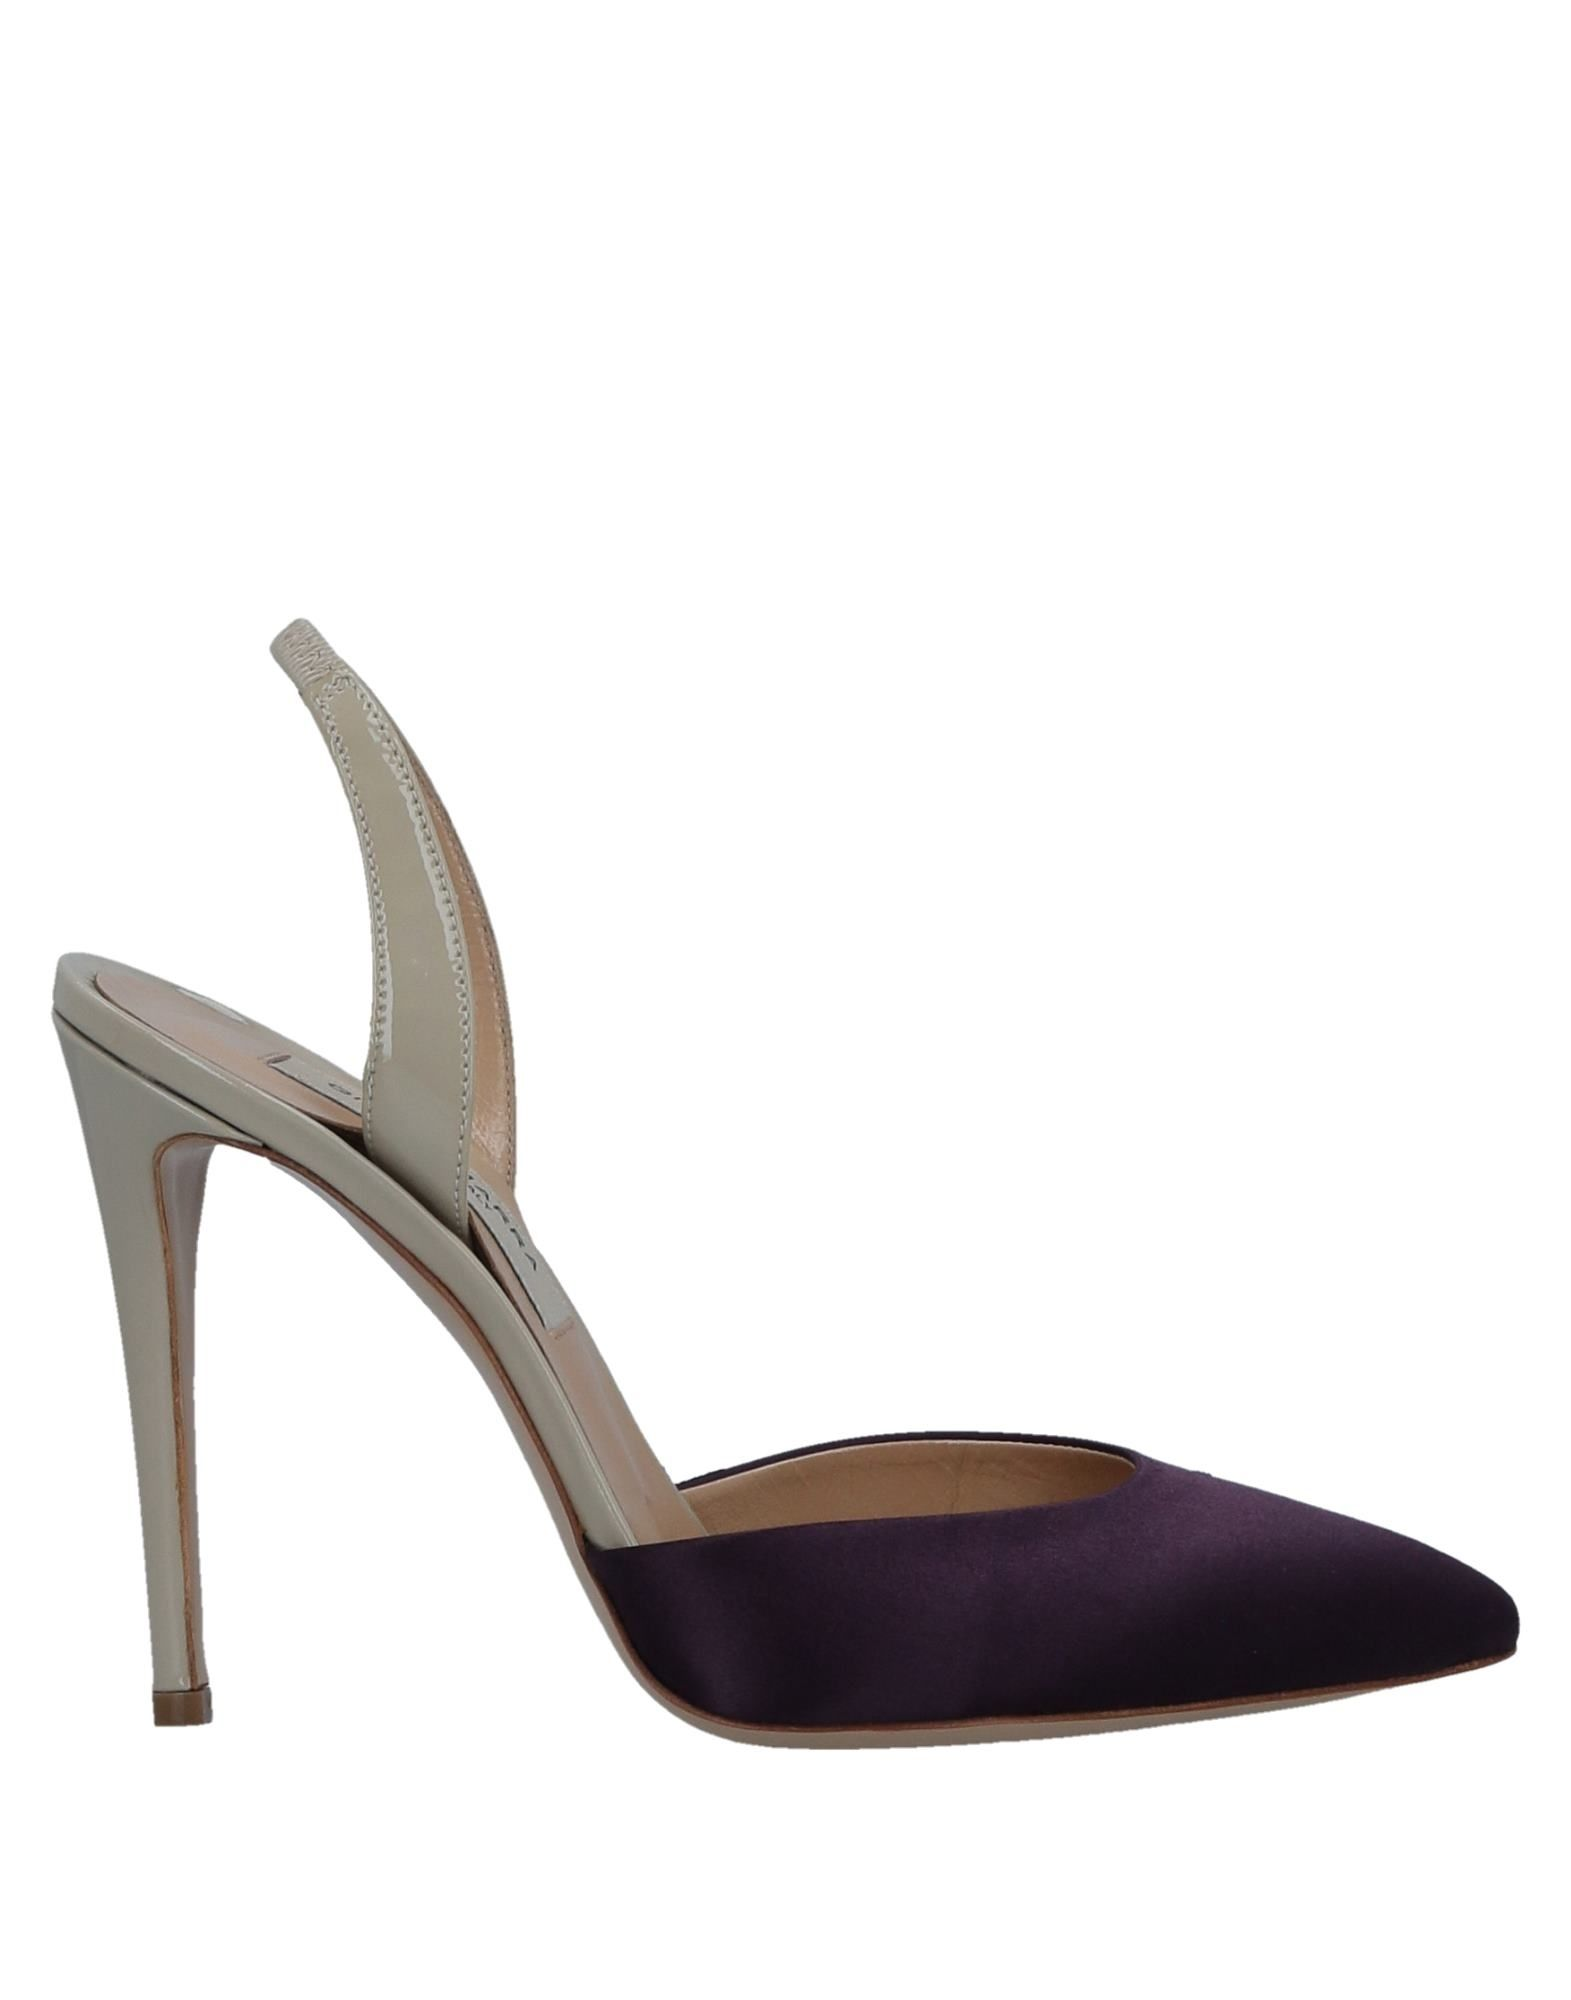 Gut um Marra billige Schuhe zu tragenGianni Marra um Pumps Damen  11525613RW a9ae41